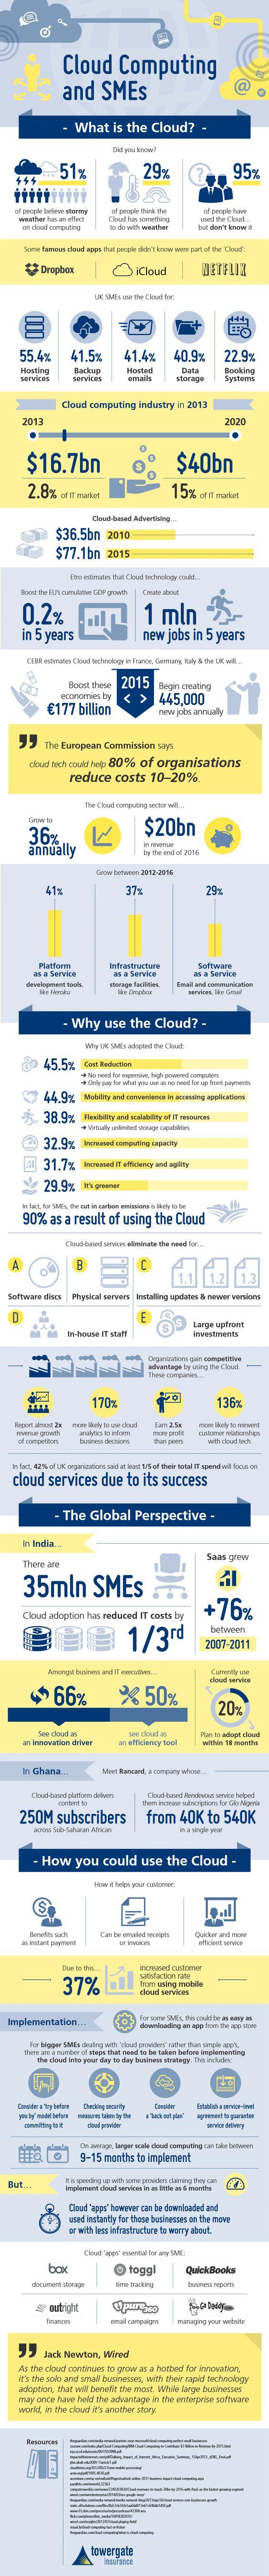 Cloud Computing and SMEs    #infographic #CloudComputing #SmallBusiness #Srartup